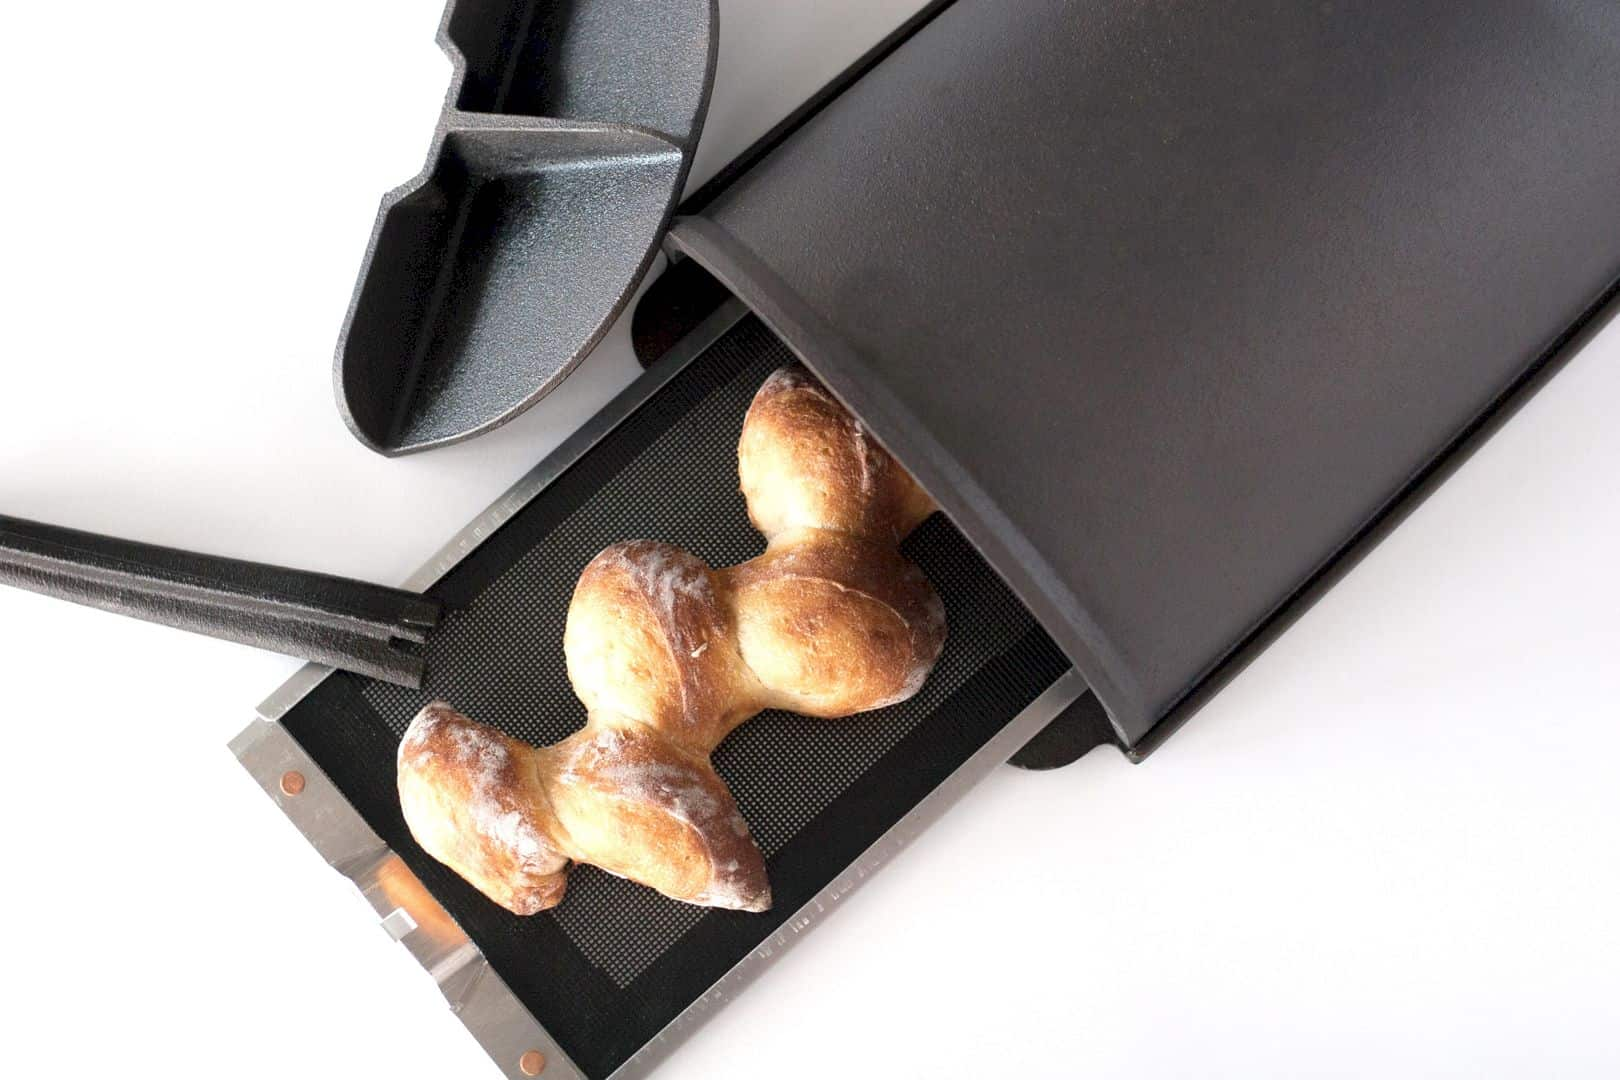 Fourneau Bread Oven 2 0 6